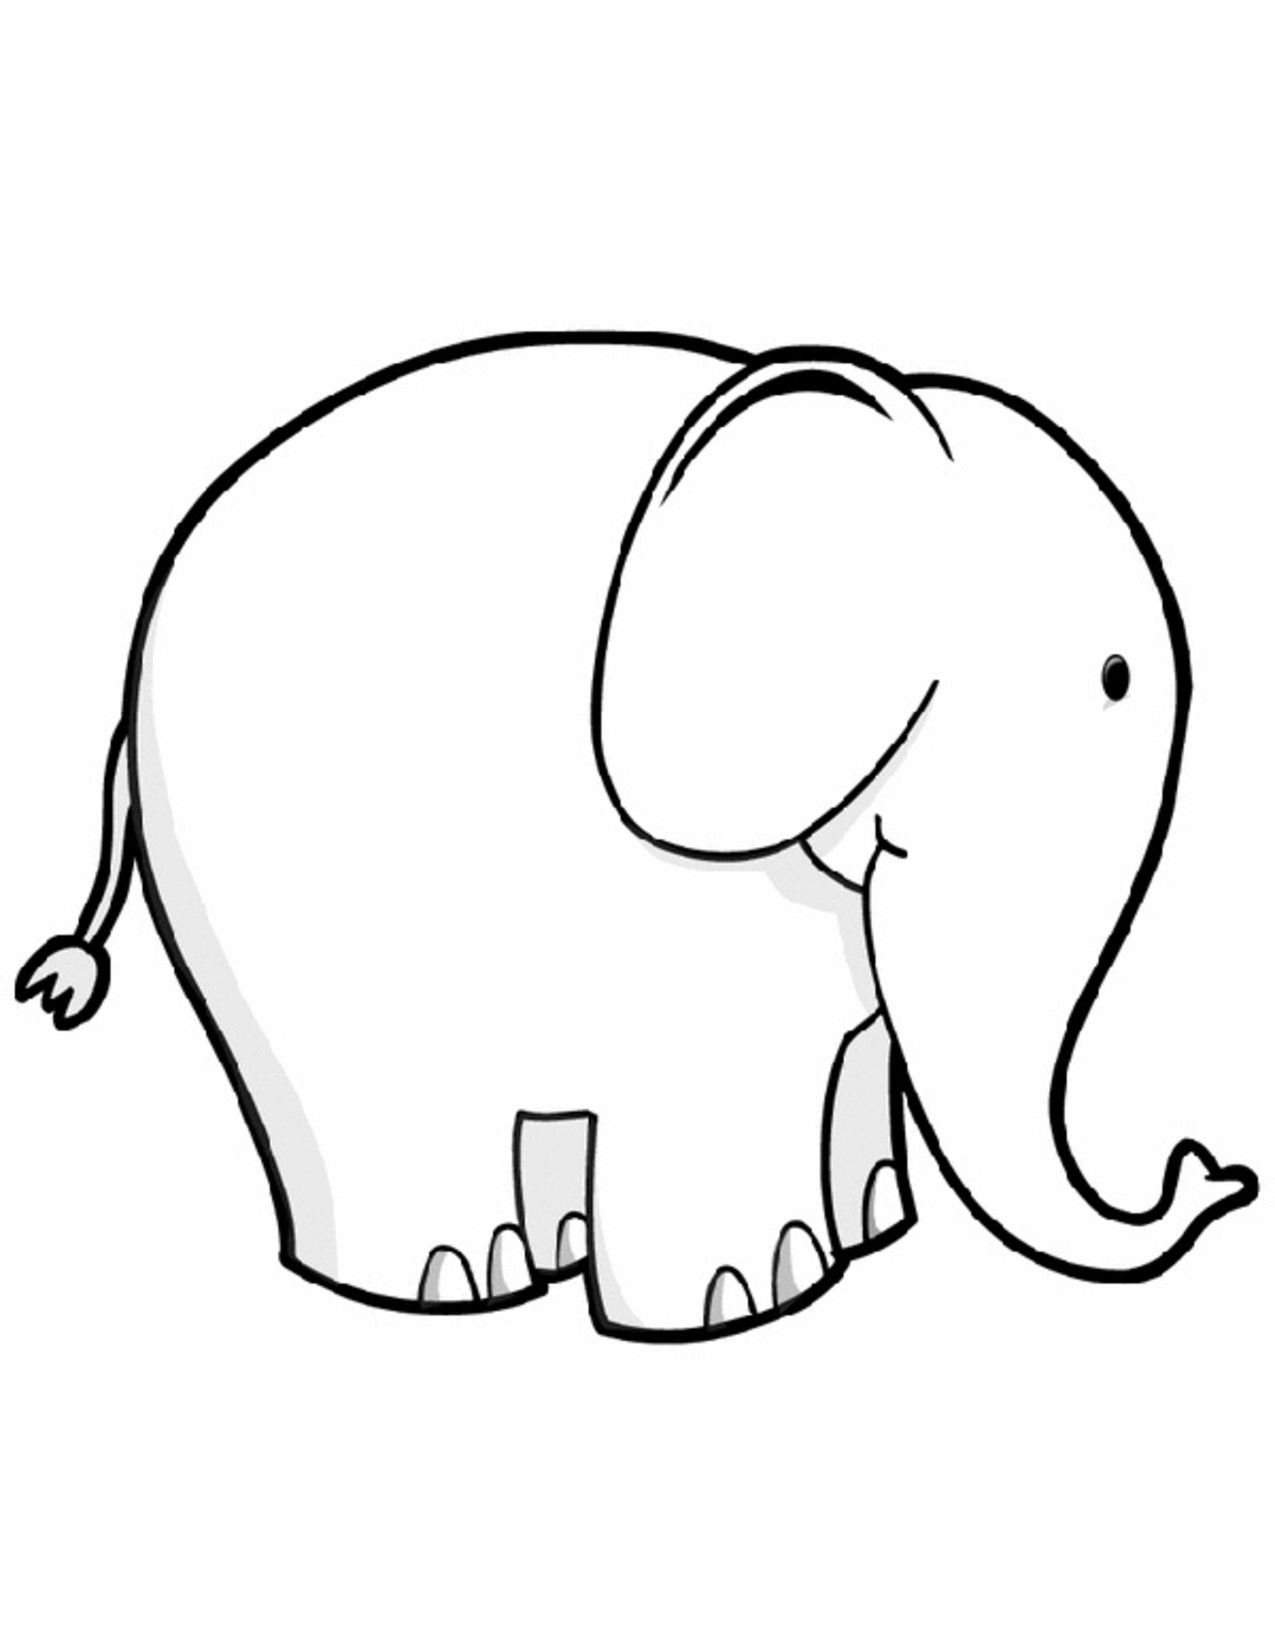 Animal Coloring Pages For Kids Cute Elephant Boyama Sayfalari